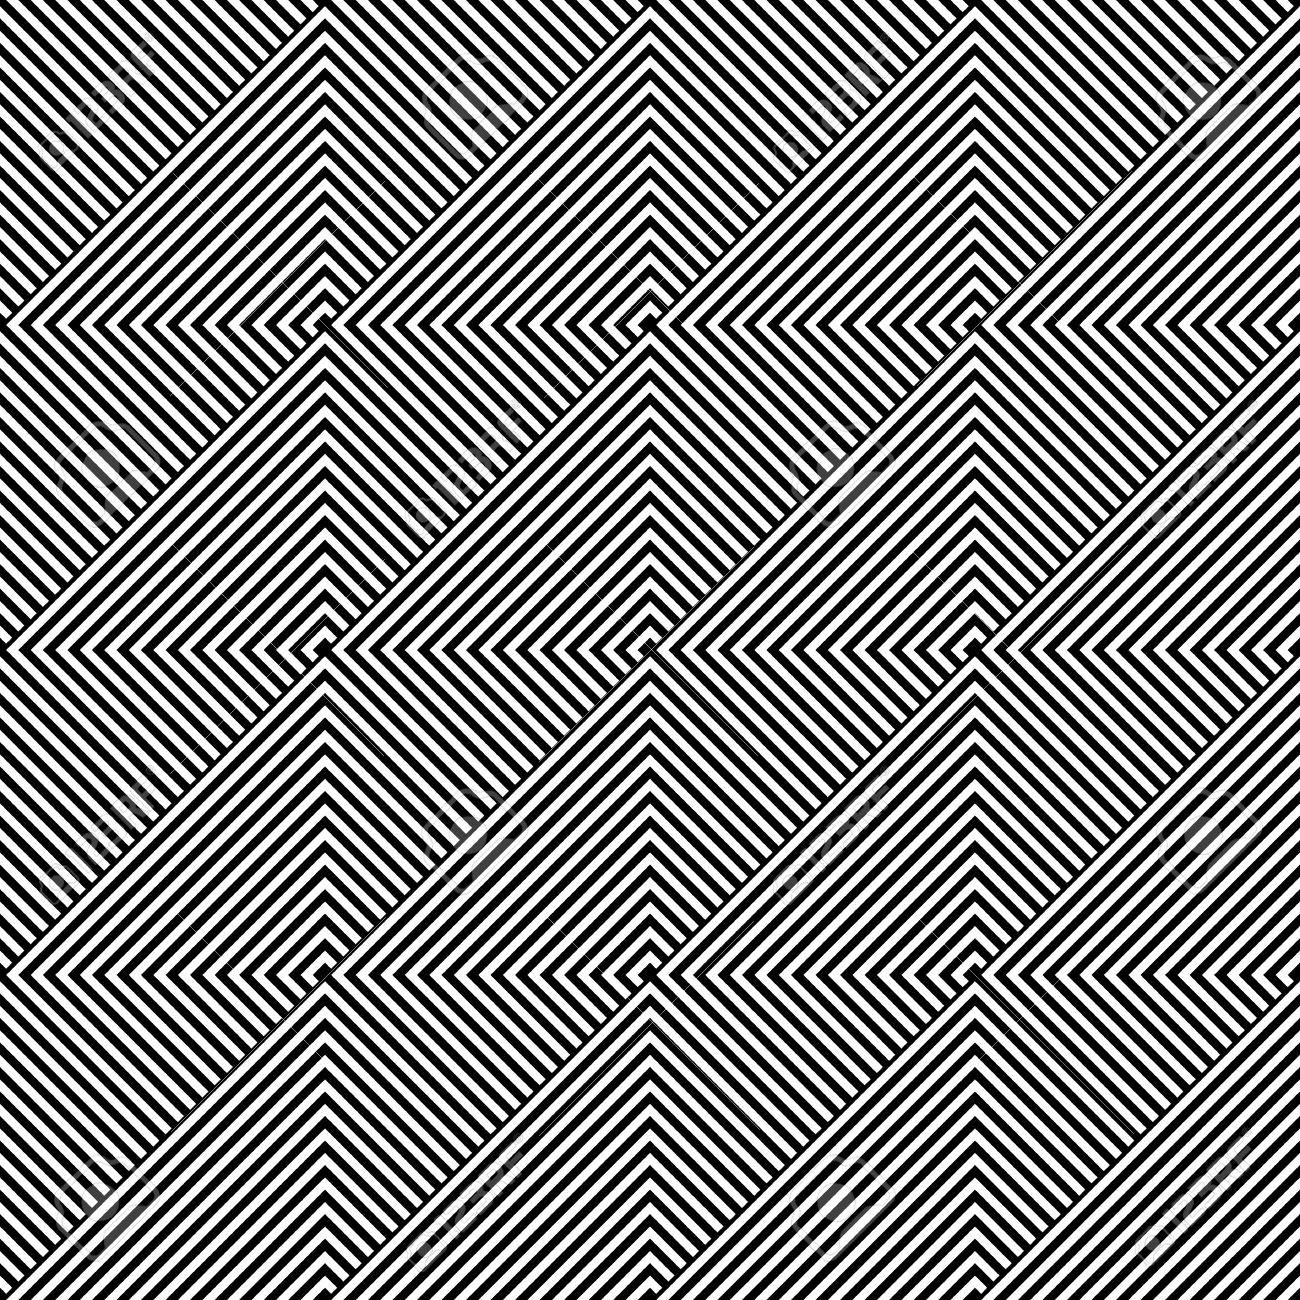 And black diagonal stripes background seamless background or wallpaper - Seamless Geometric Diagonal Texture Vector Art Stock Vector 16765516